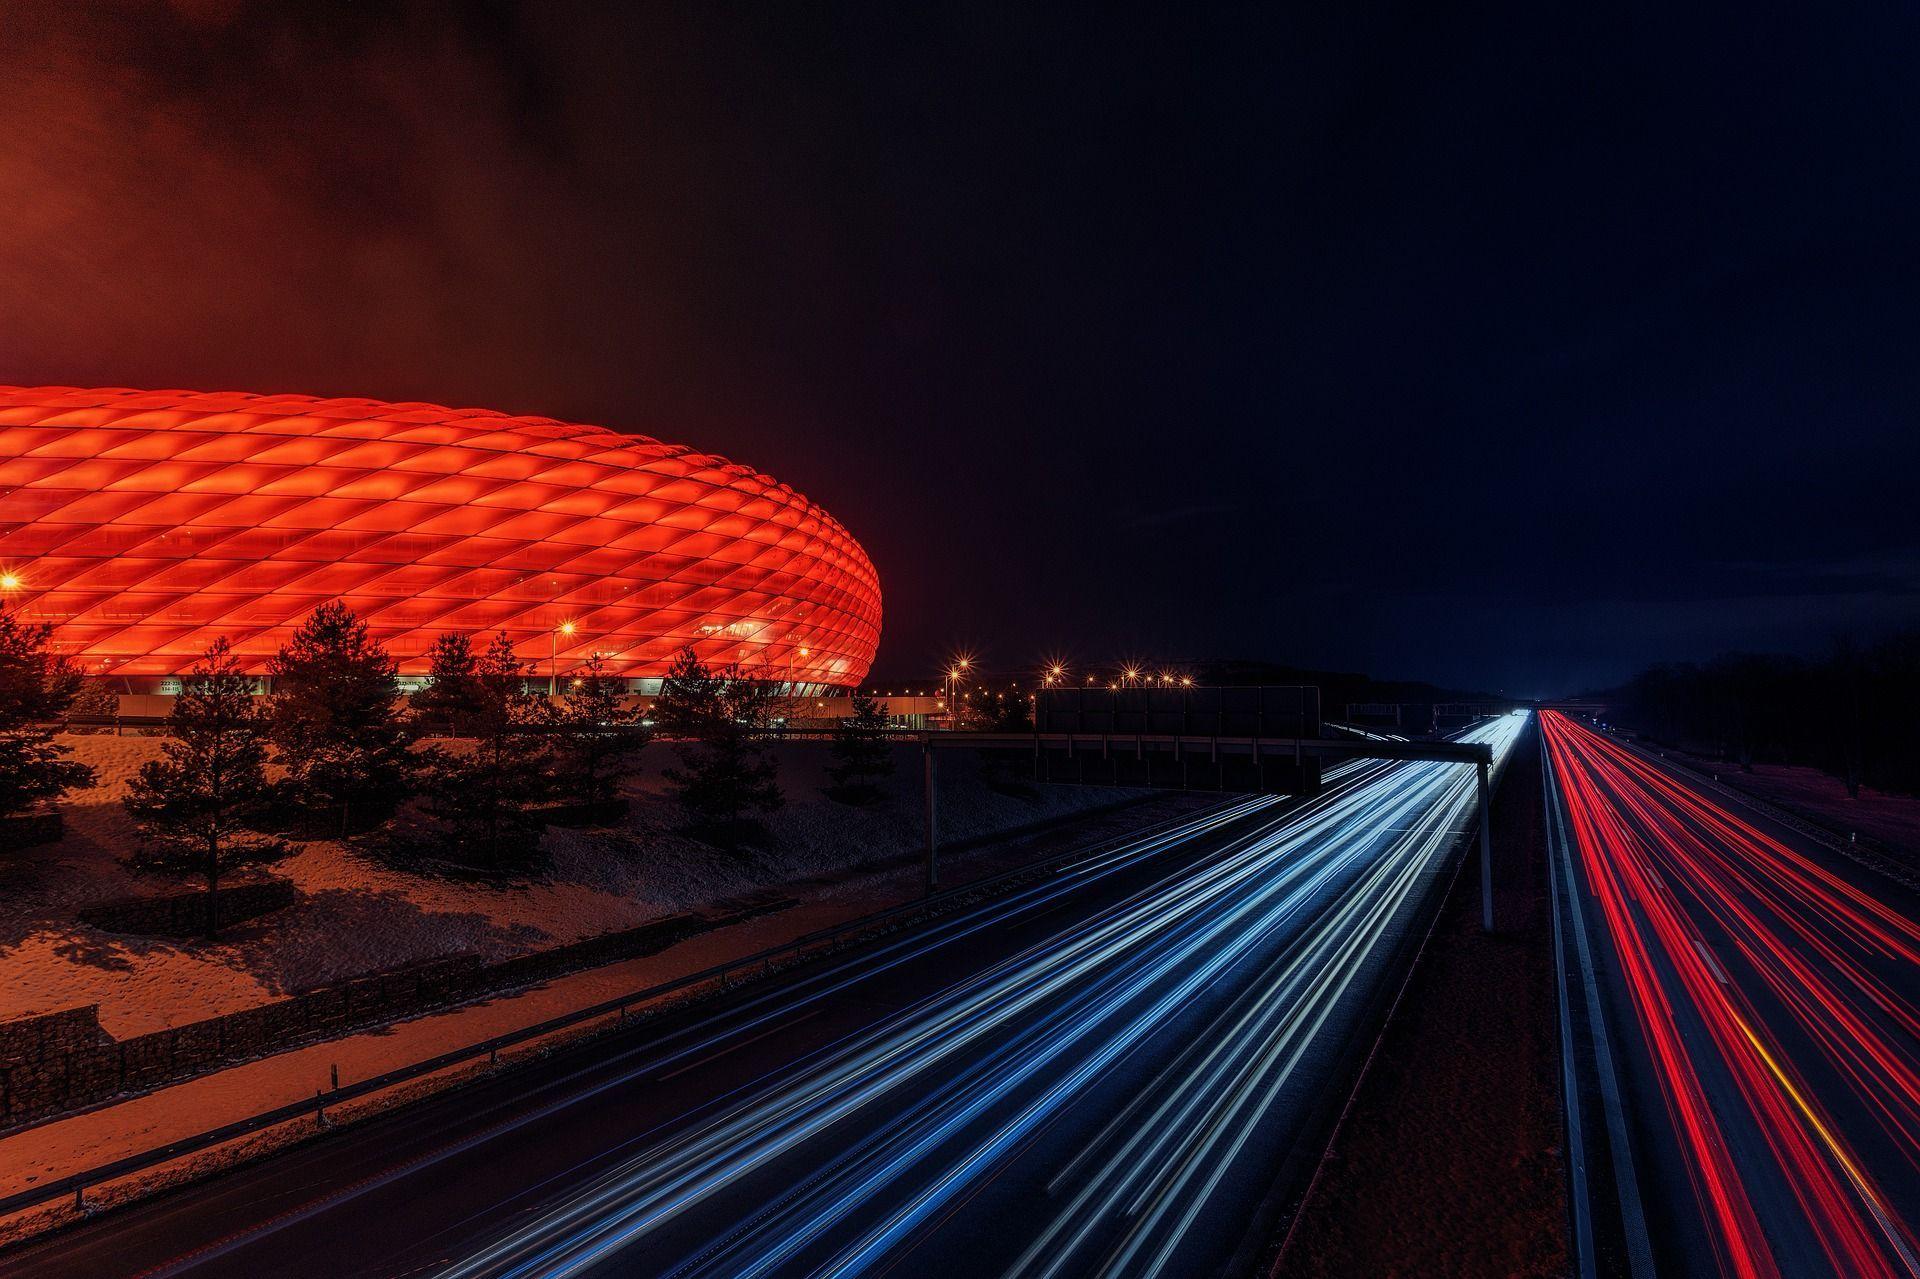 Very Cool Time Lapsed Photo Of The Baku Olympic Stadium At Night In Baku Azerbaijan Tuesdaytravel